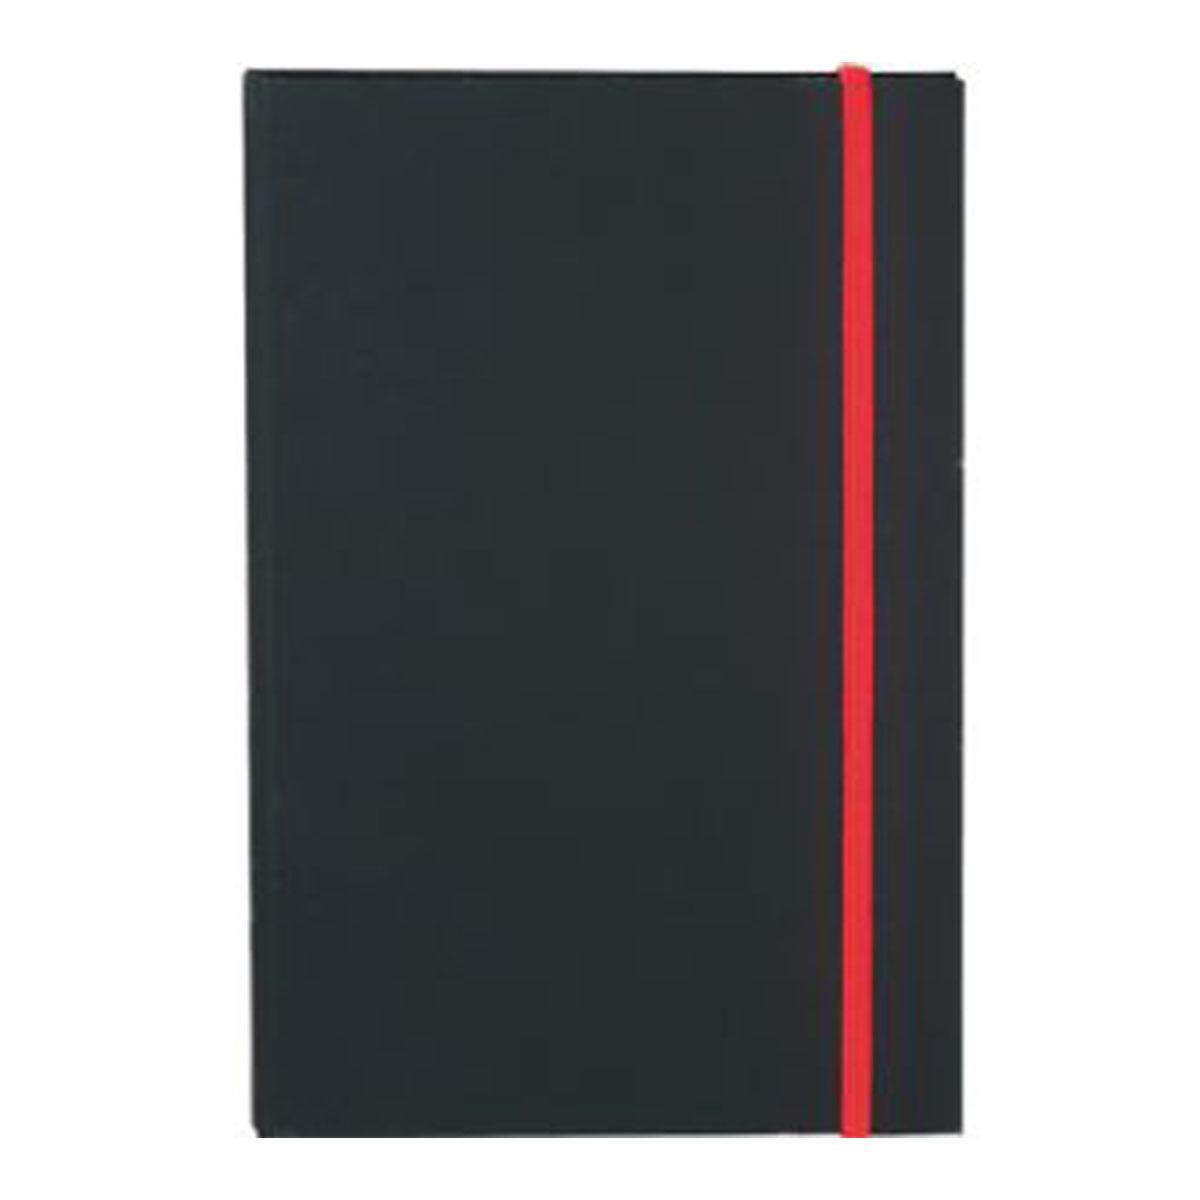 Colour Pop JournalBook-Black + Red